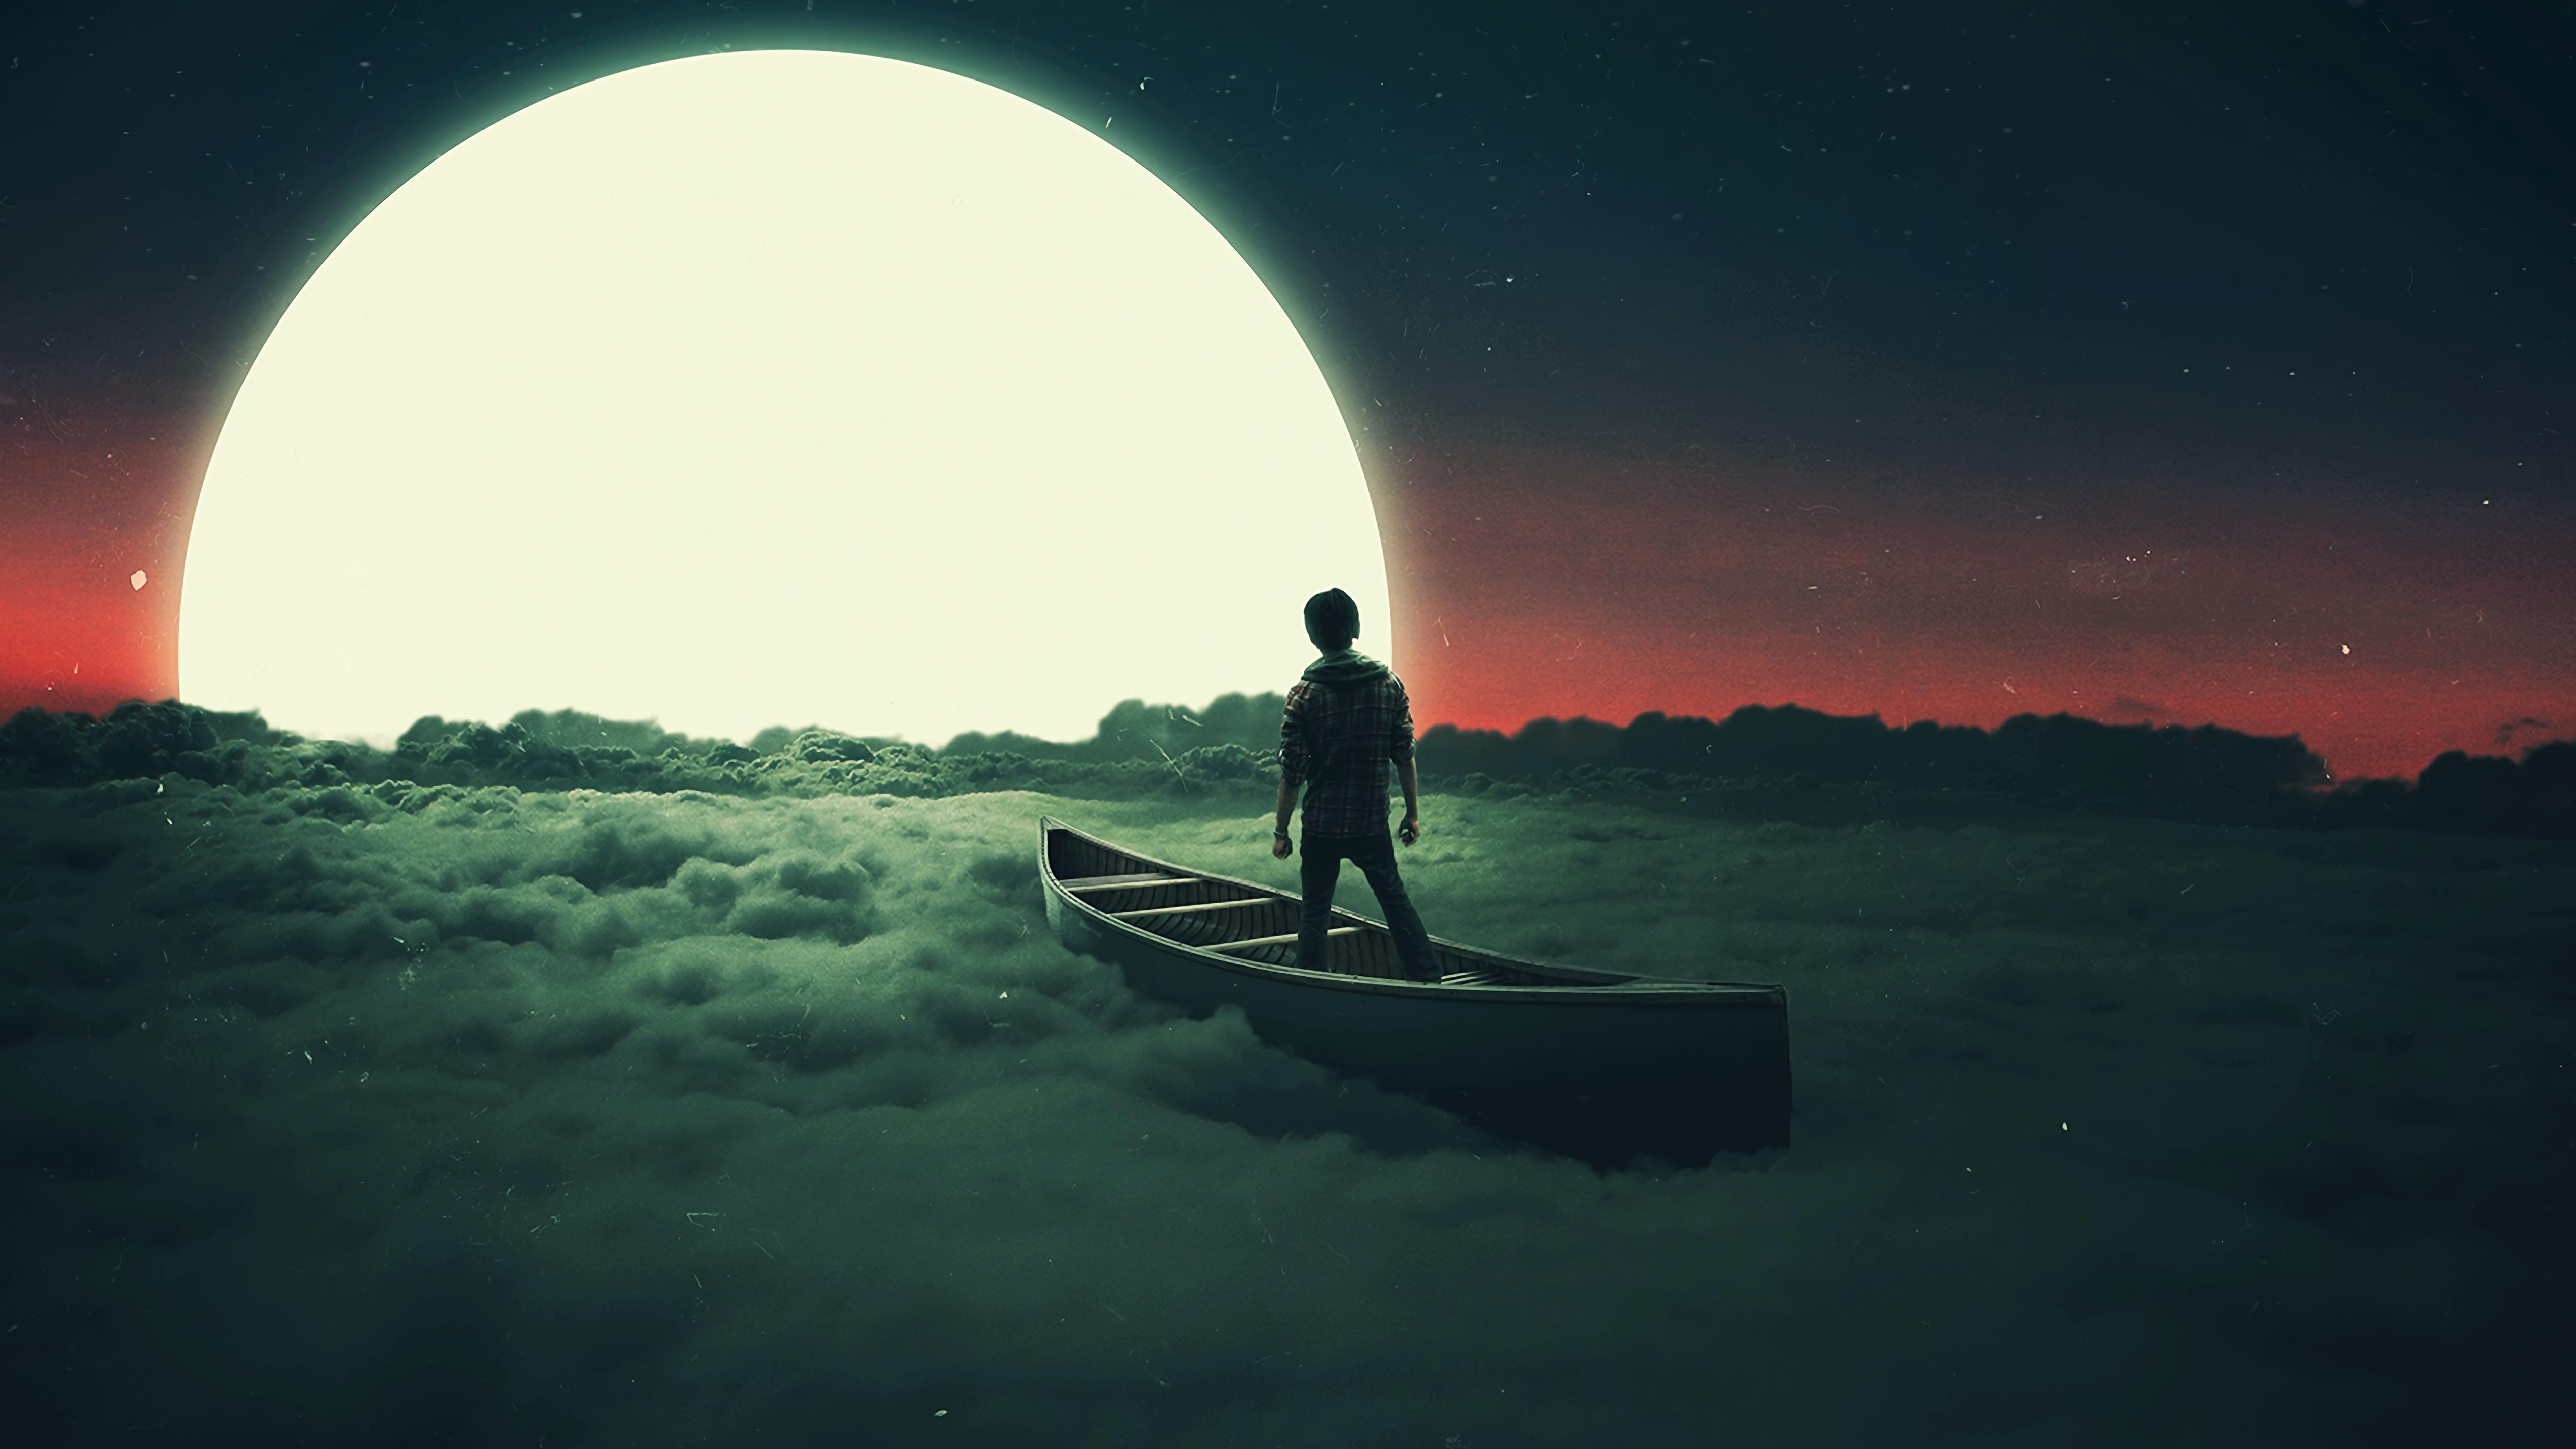 sail-to-the-moon-5k-mv.jpg